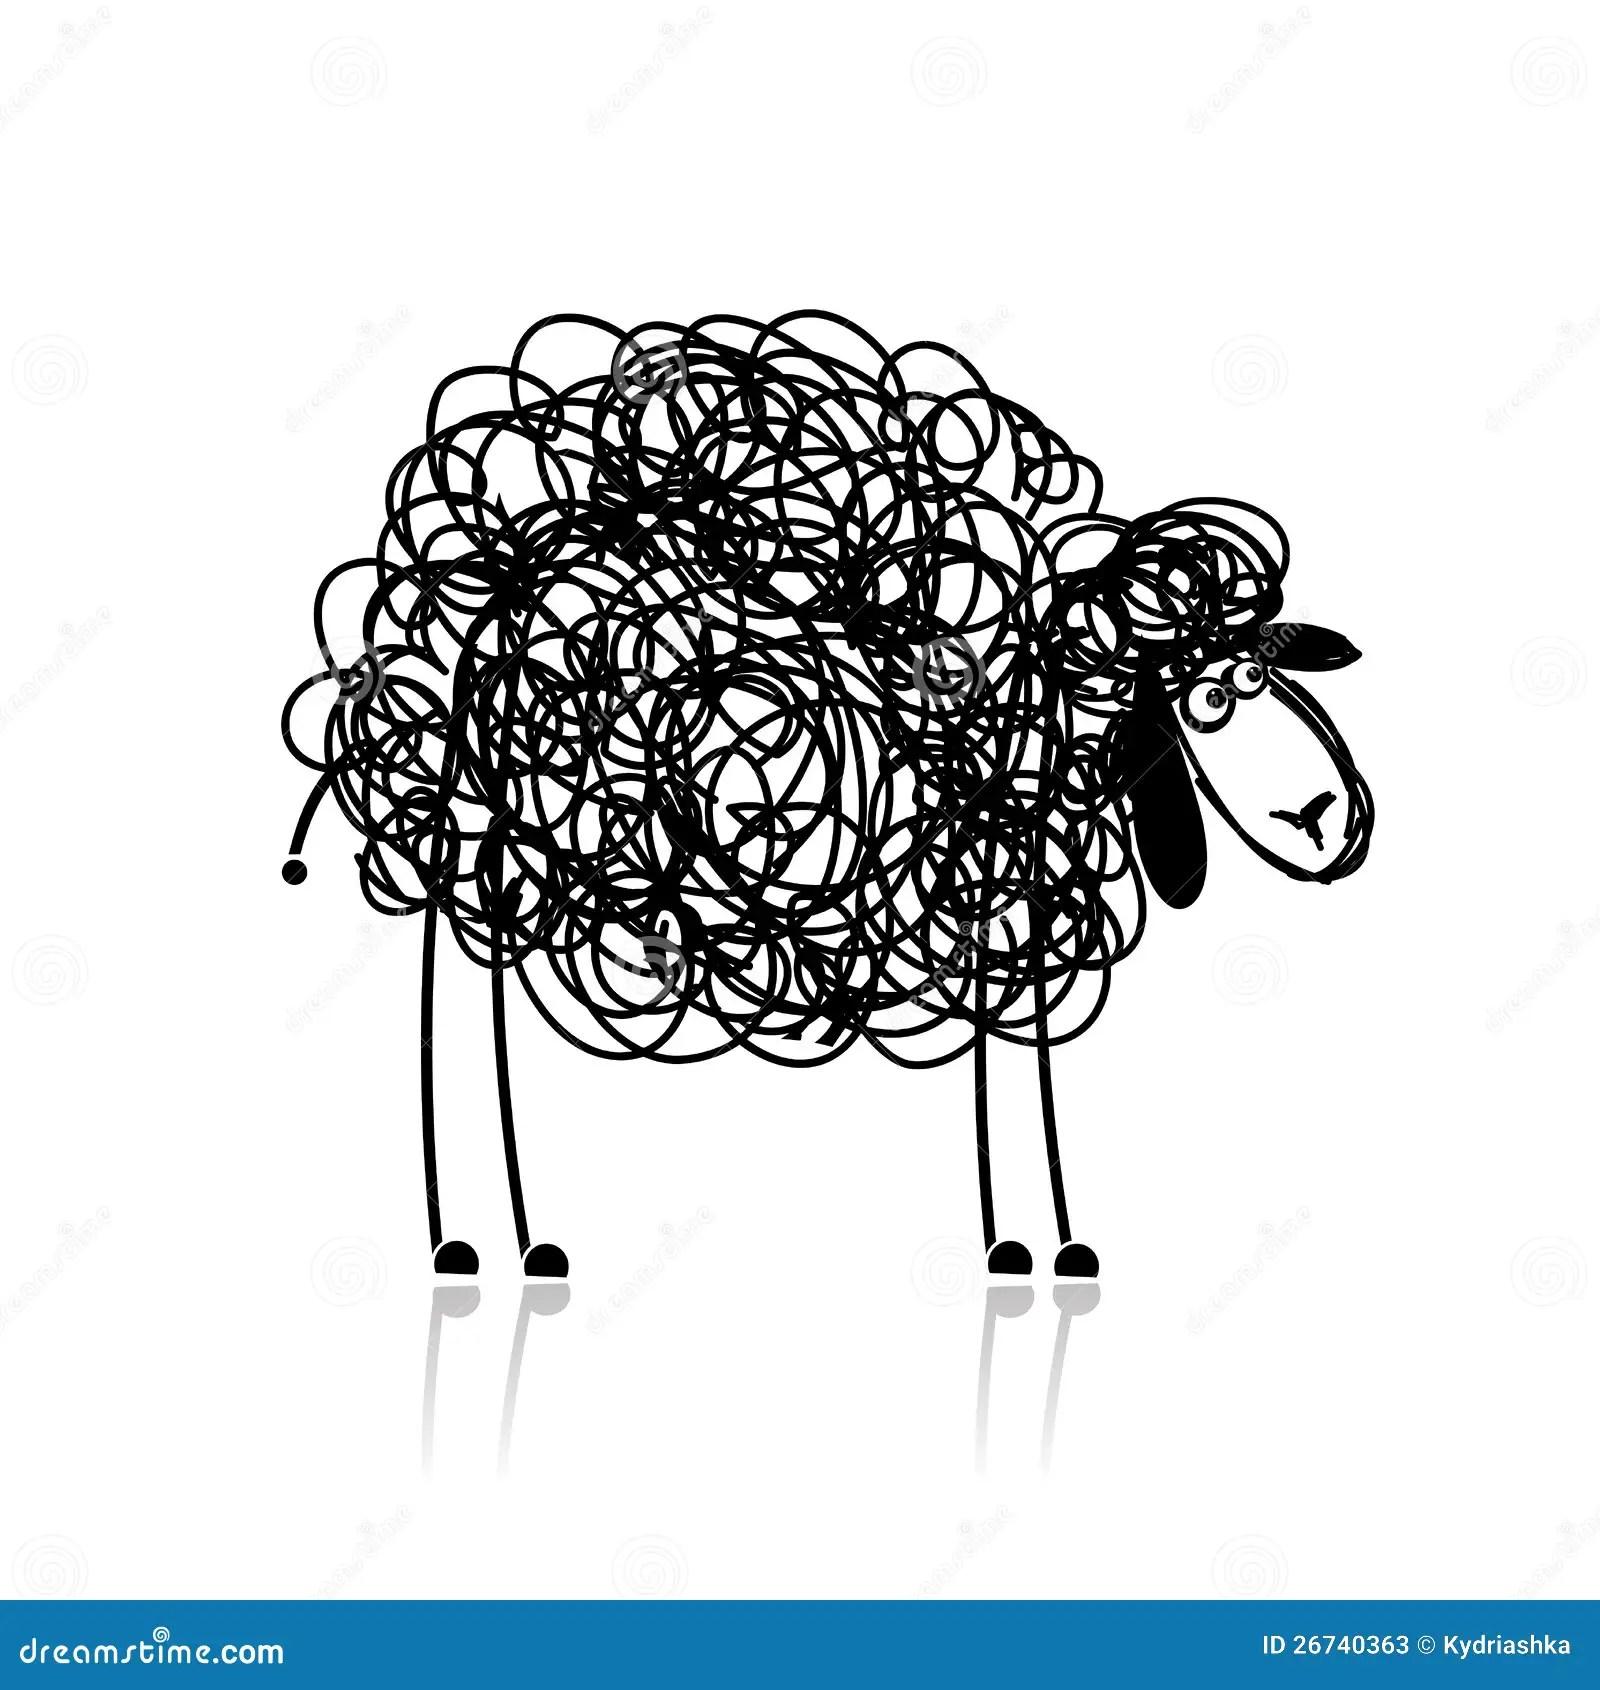 Funny Black Sheep Sketch Stock Photos